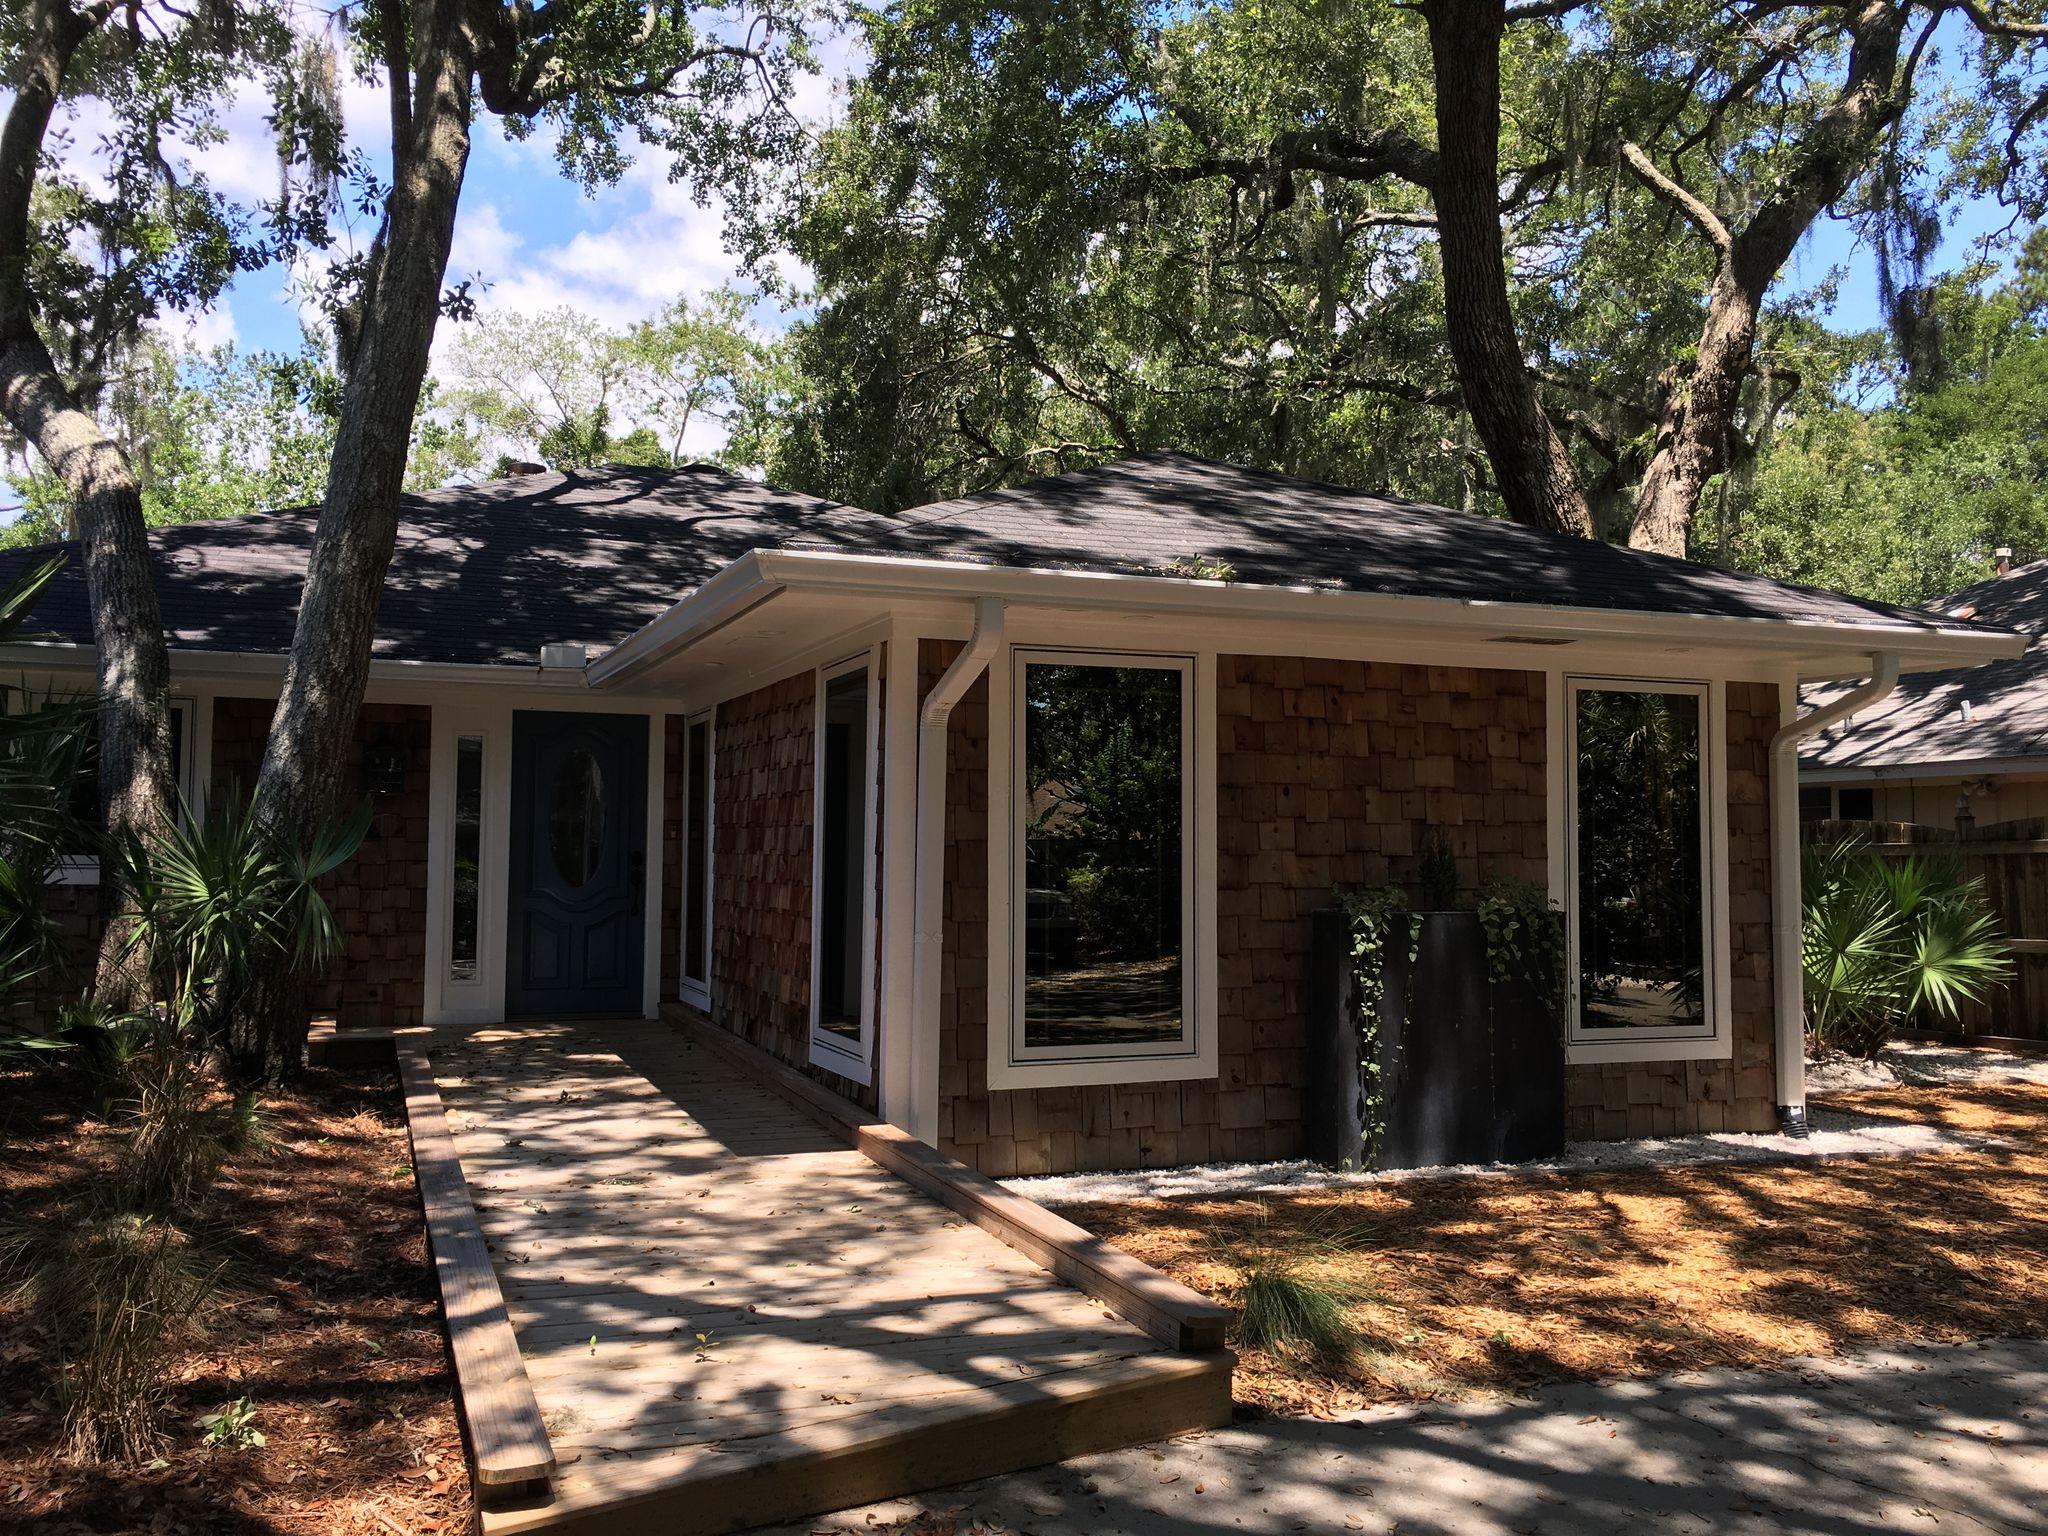 realty soldlistings sold country htm in log for cabins ozark sale homes alabama